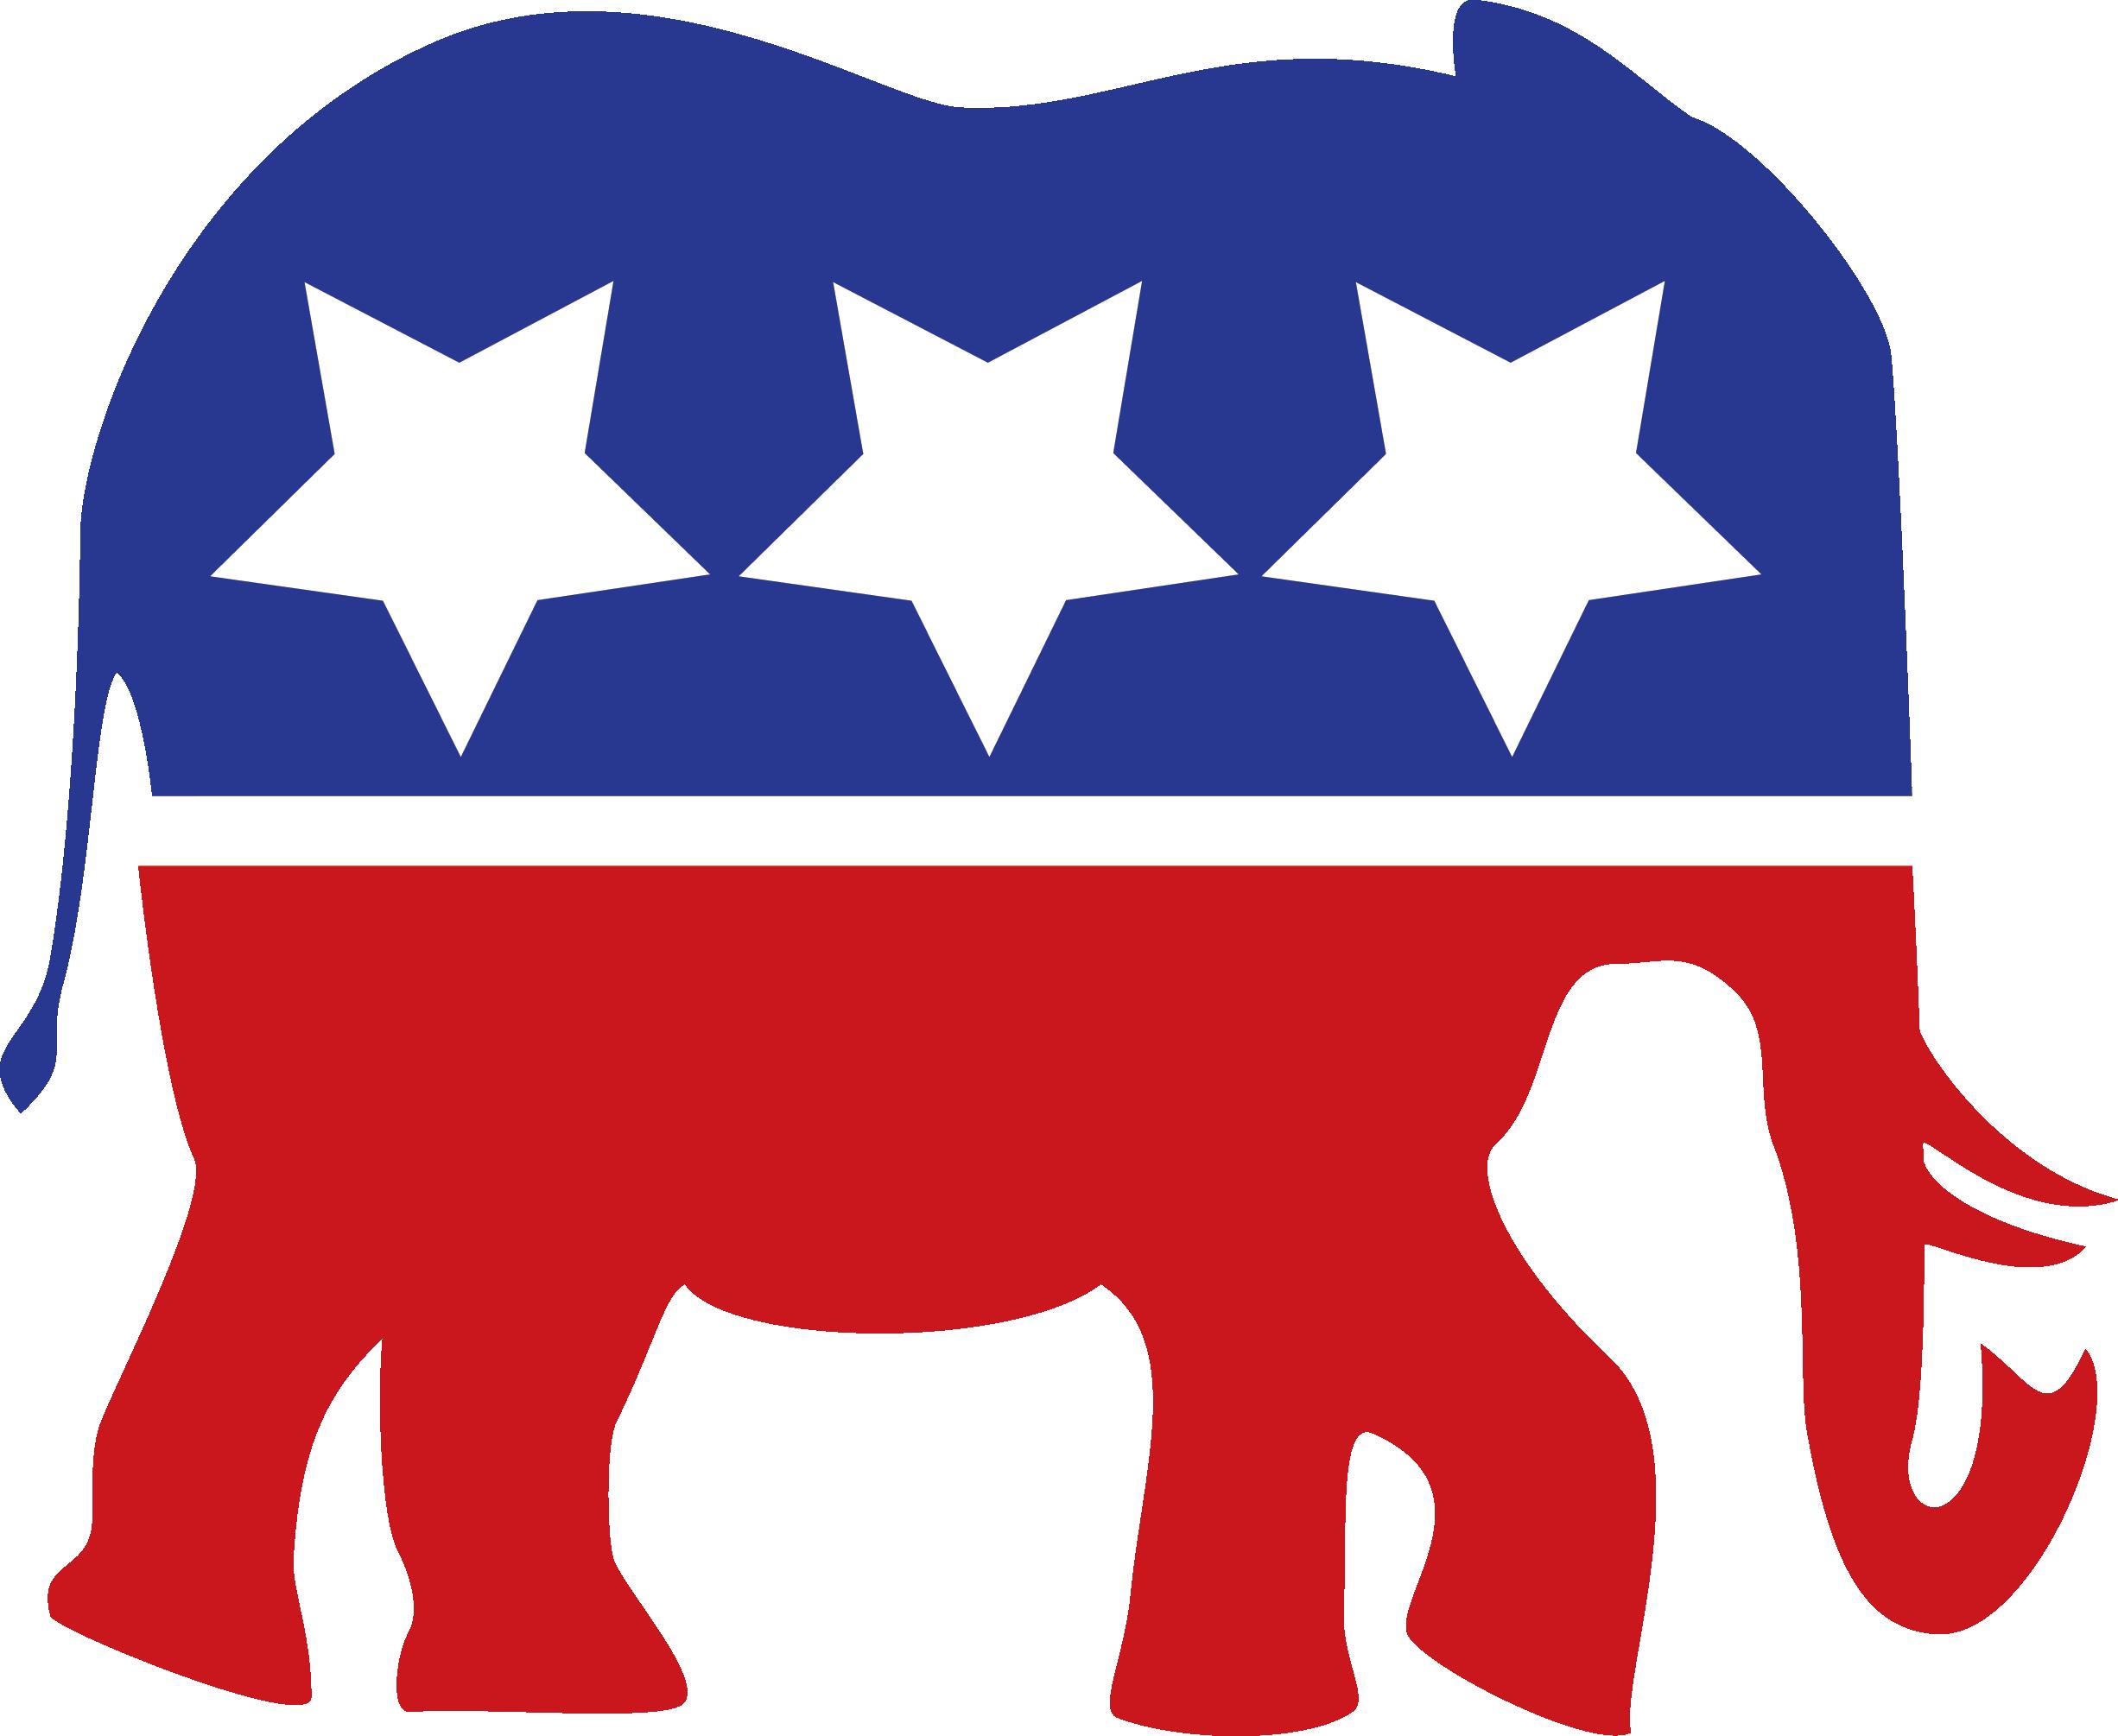 collection of party. Politics clipart republican democrat